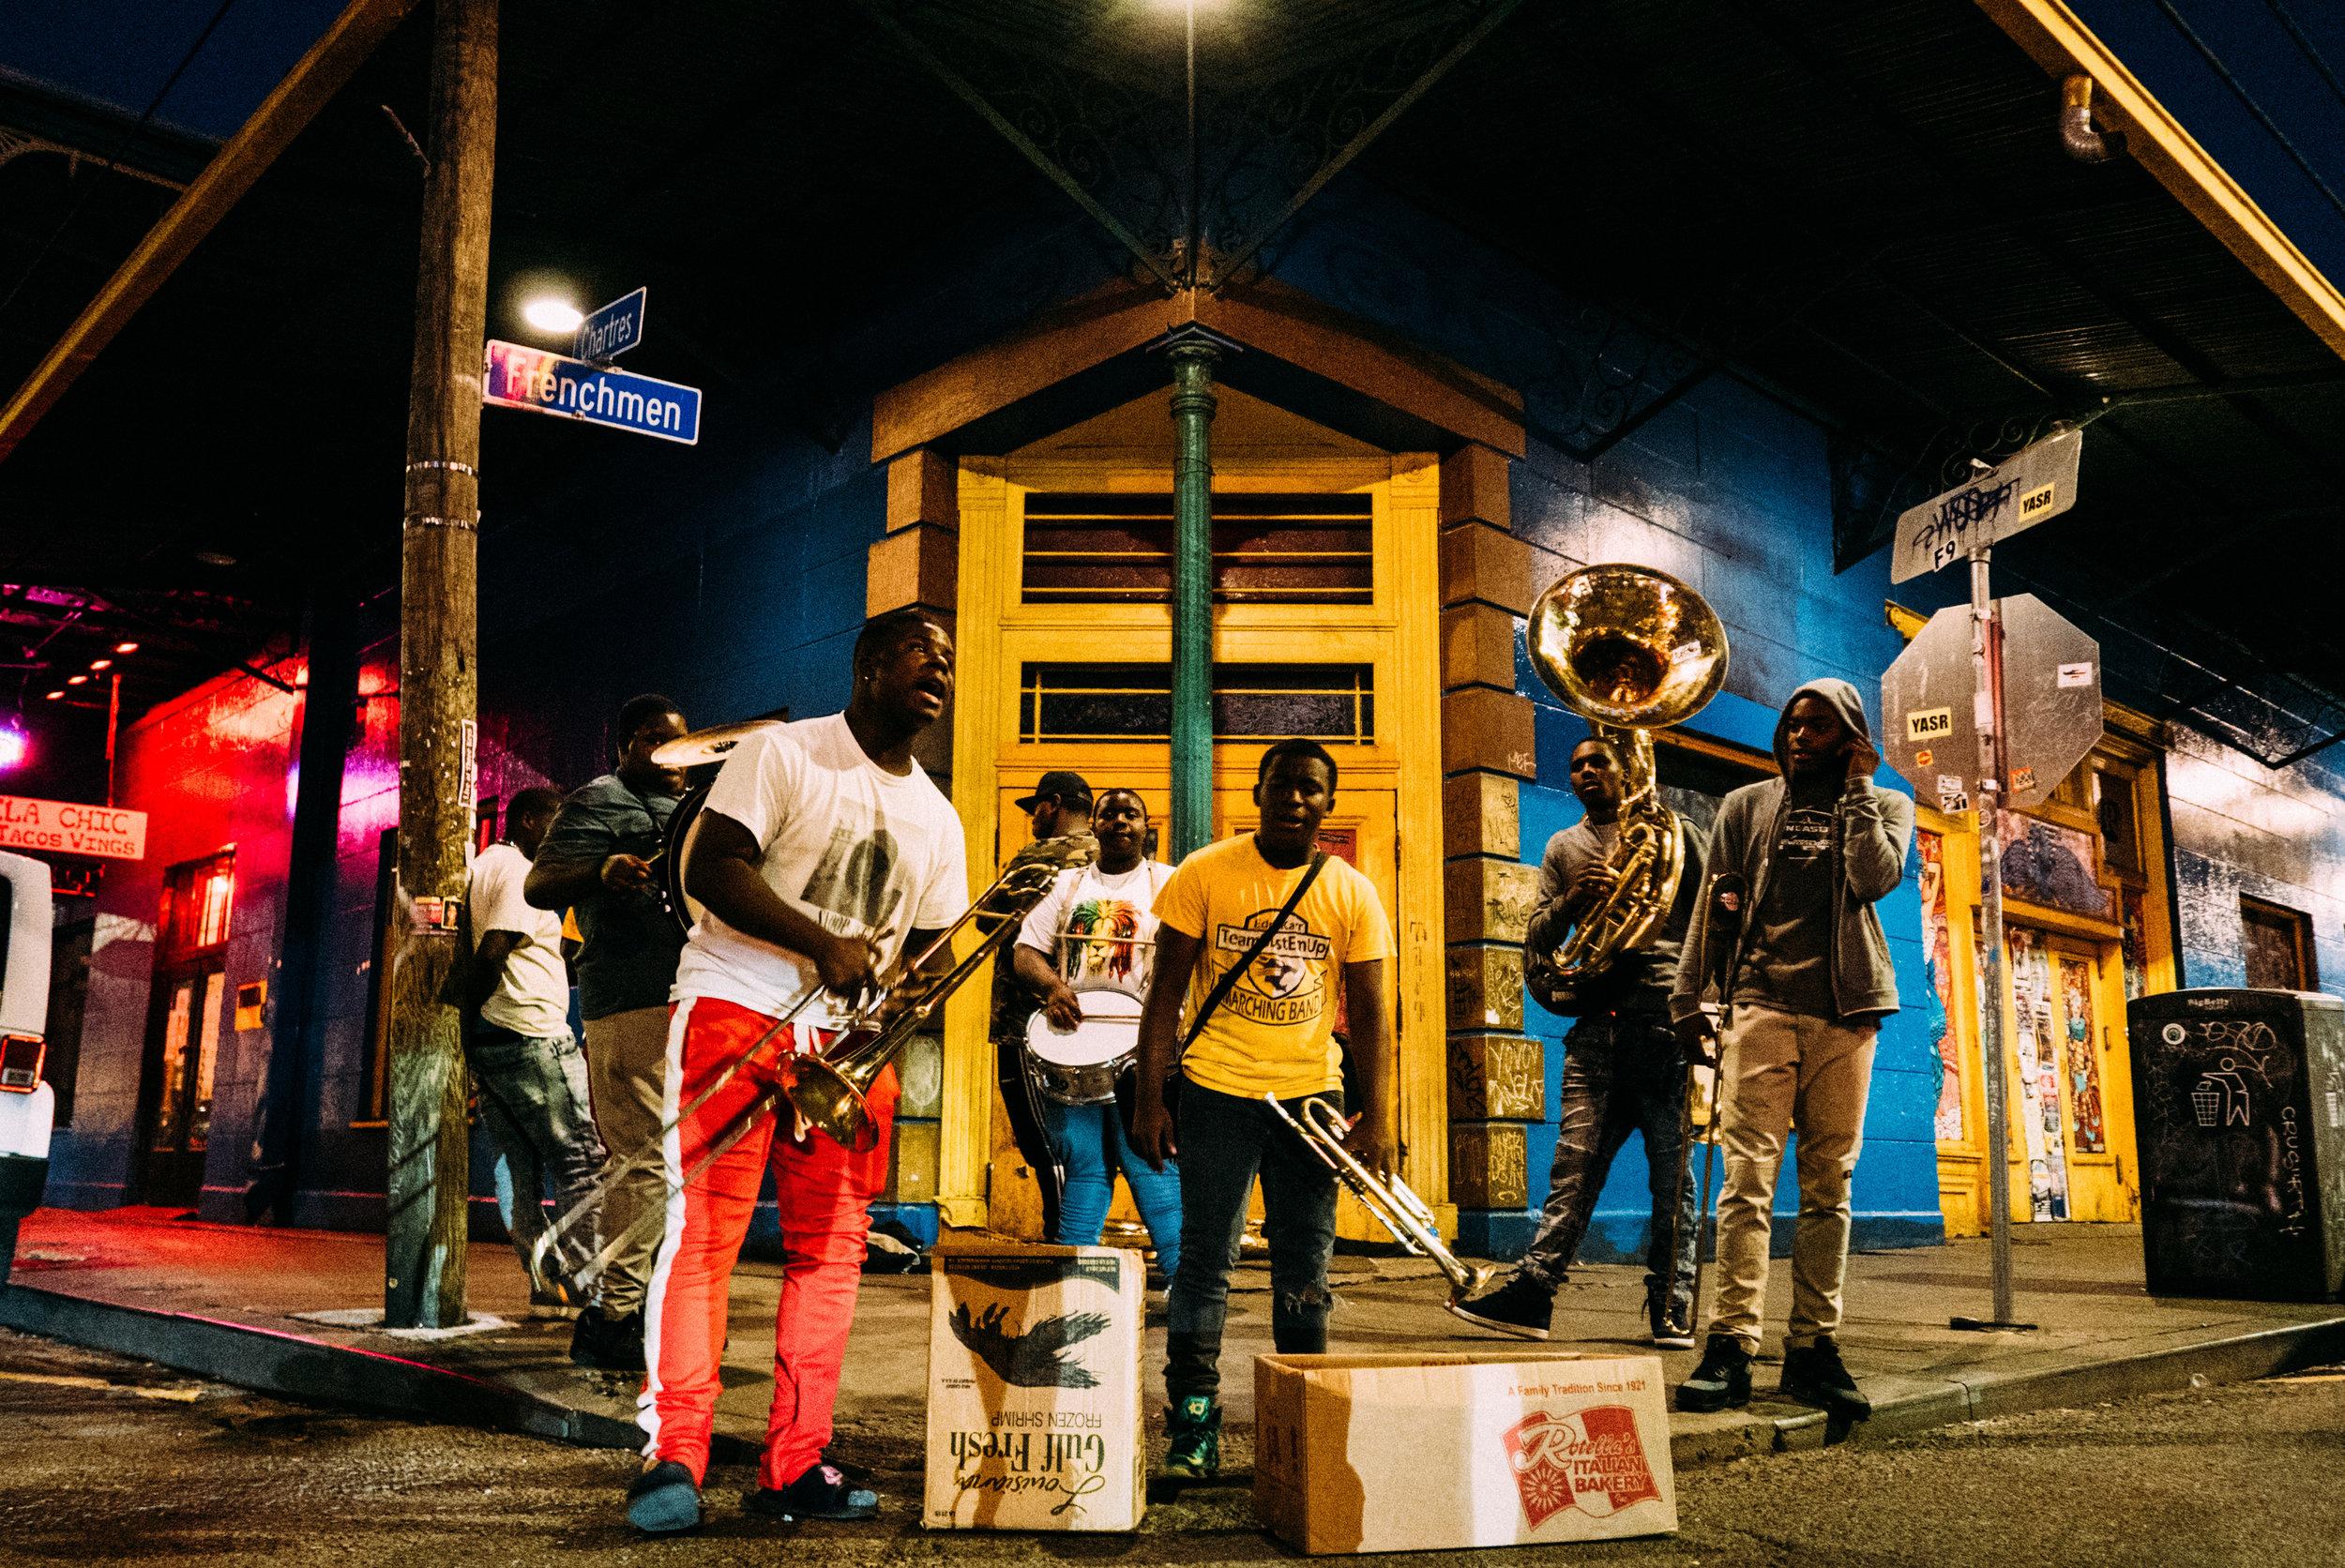 Street musicians on Frenchmen Street